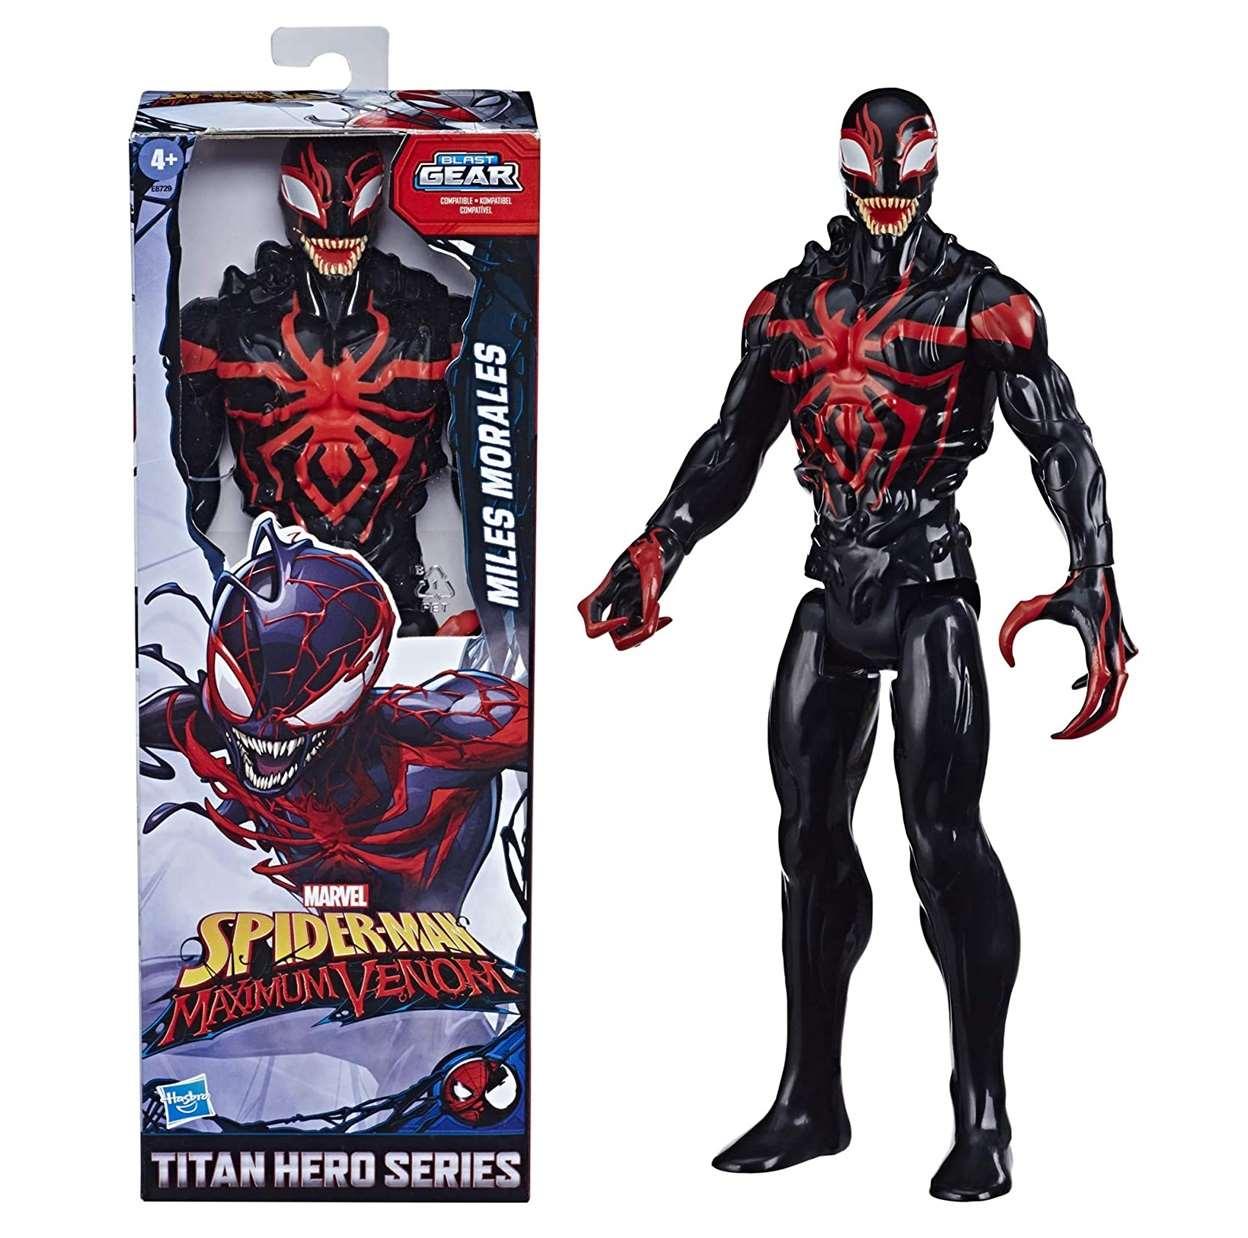 Miles Morales Figura Marvel Maximum Venom Blast Gear 12 PuLG